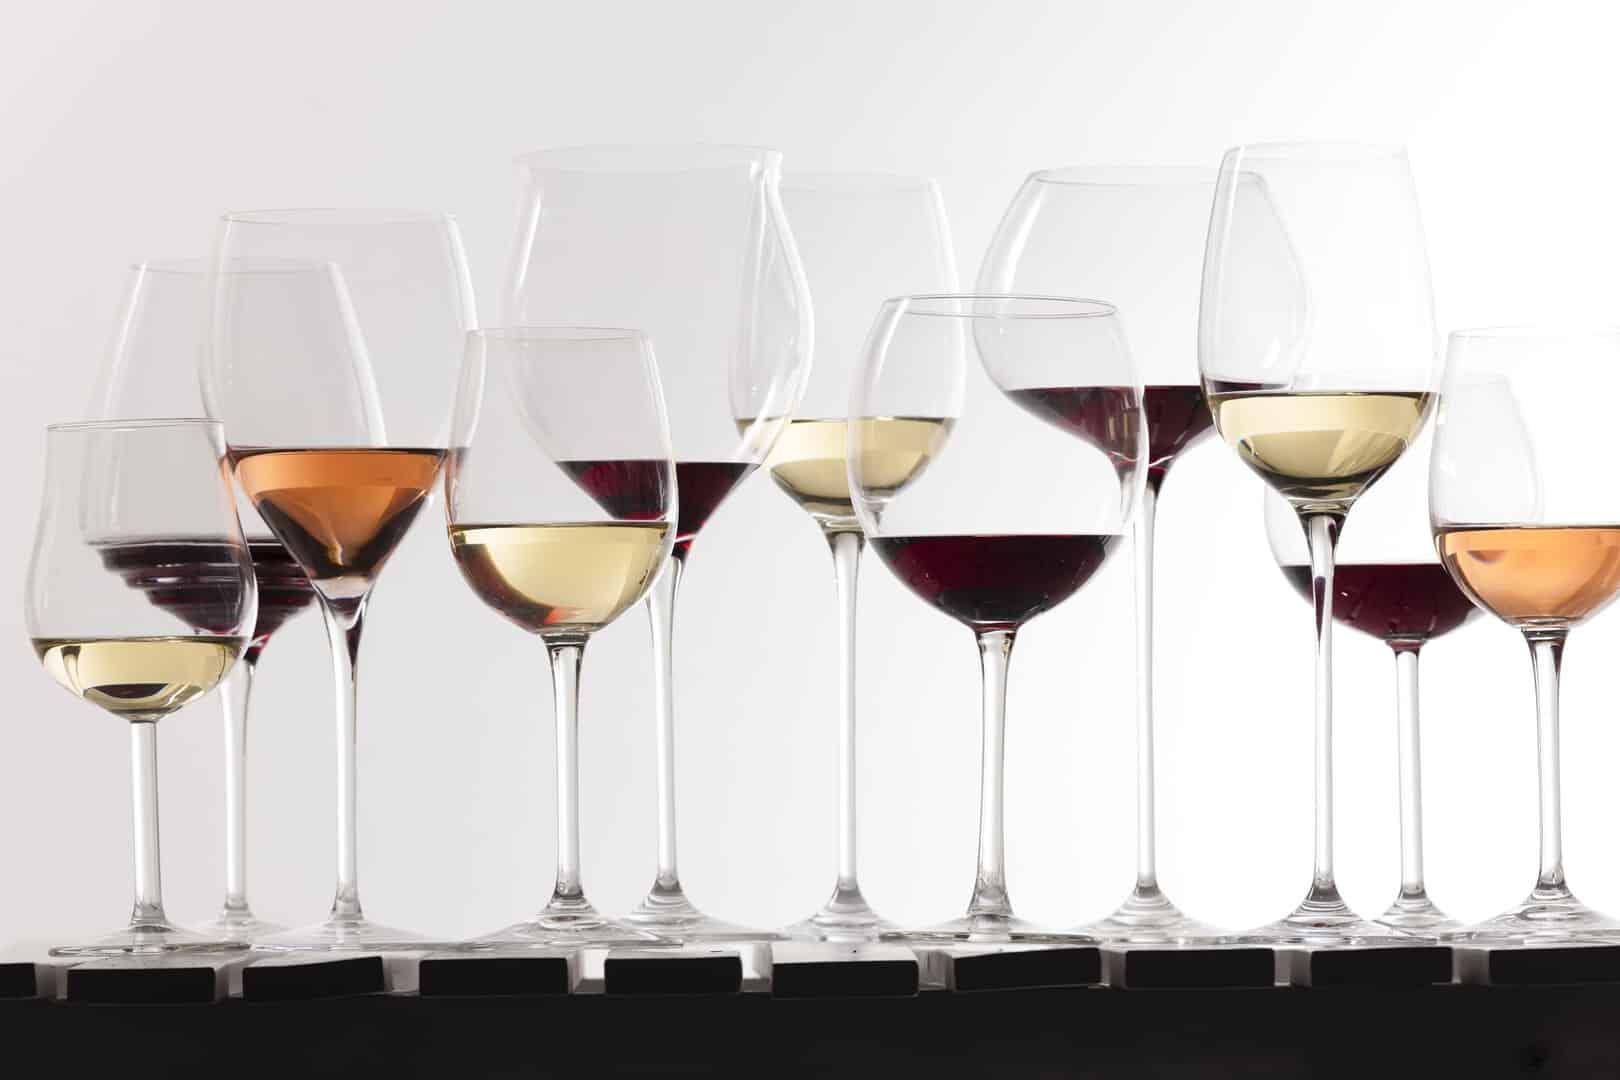 Wine Glass Selection Matters